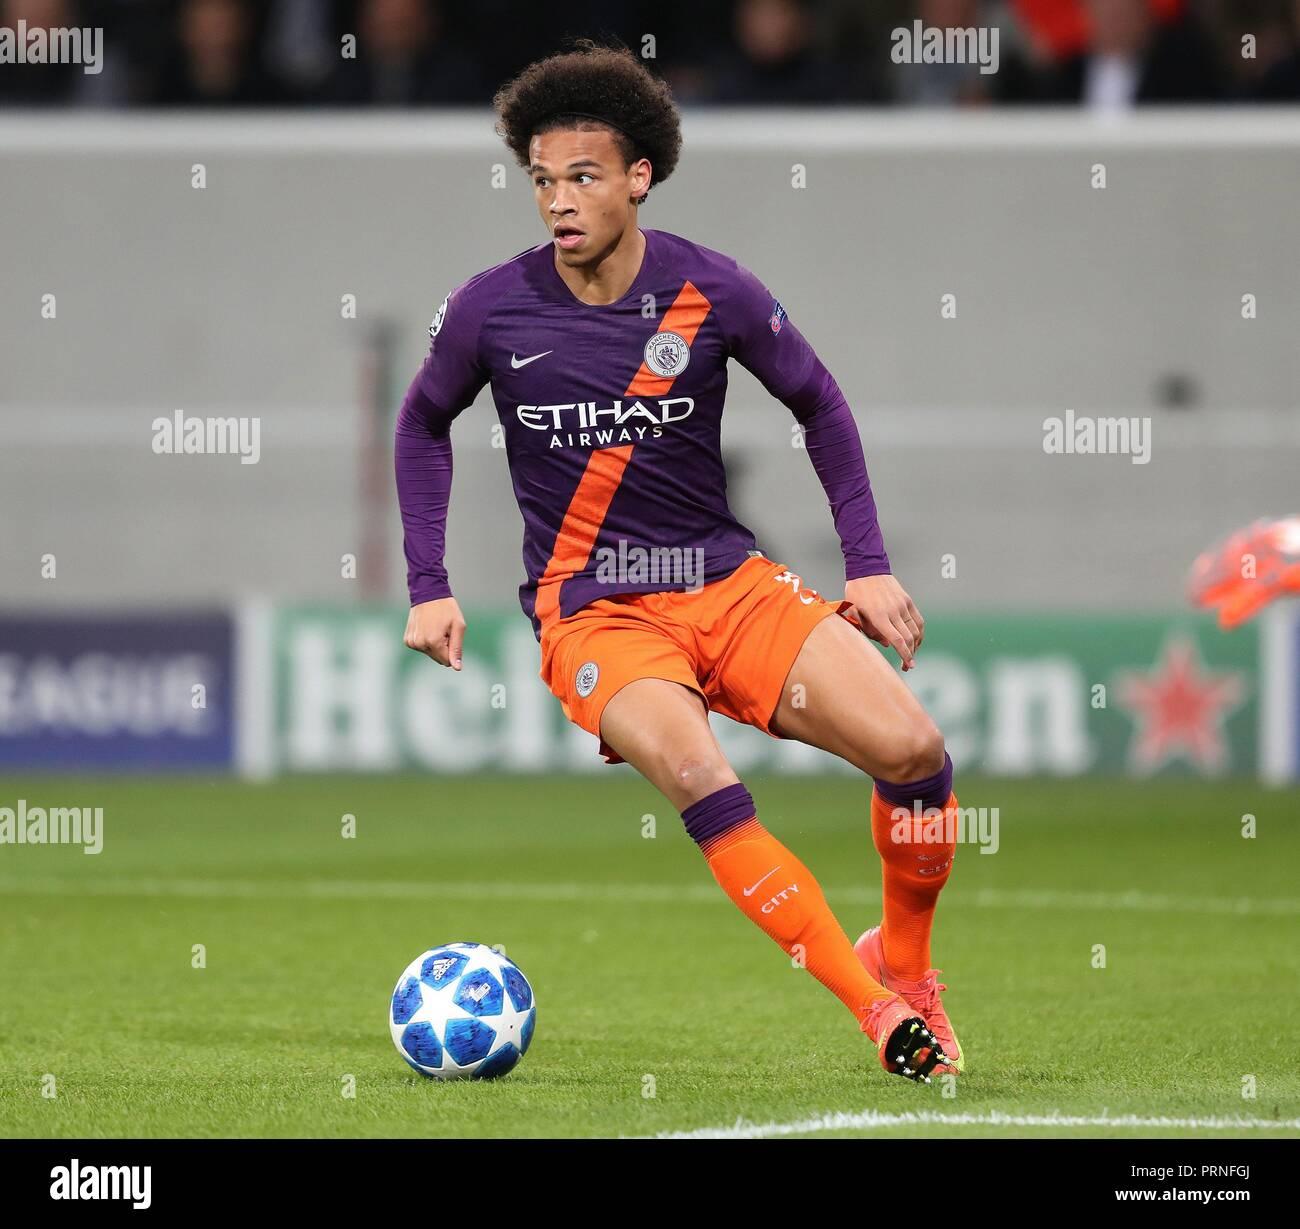 firo: 02.10.2018 Football, Football, Champions League: TSG Hoffenheim - Manchester City 1: 2 single action Leroy Sane   usage worldwide - Stock Image